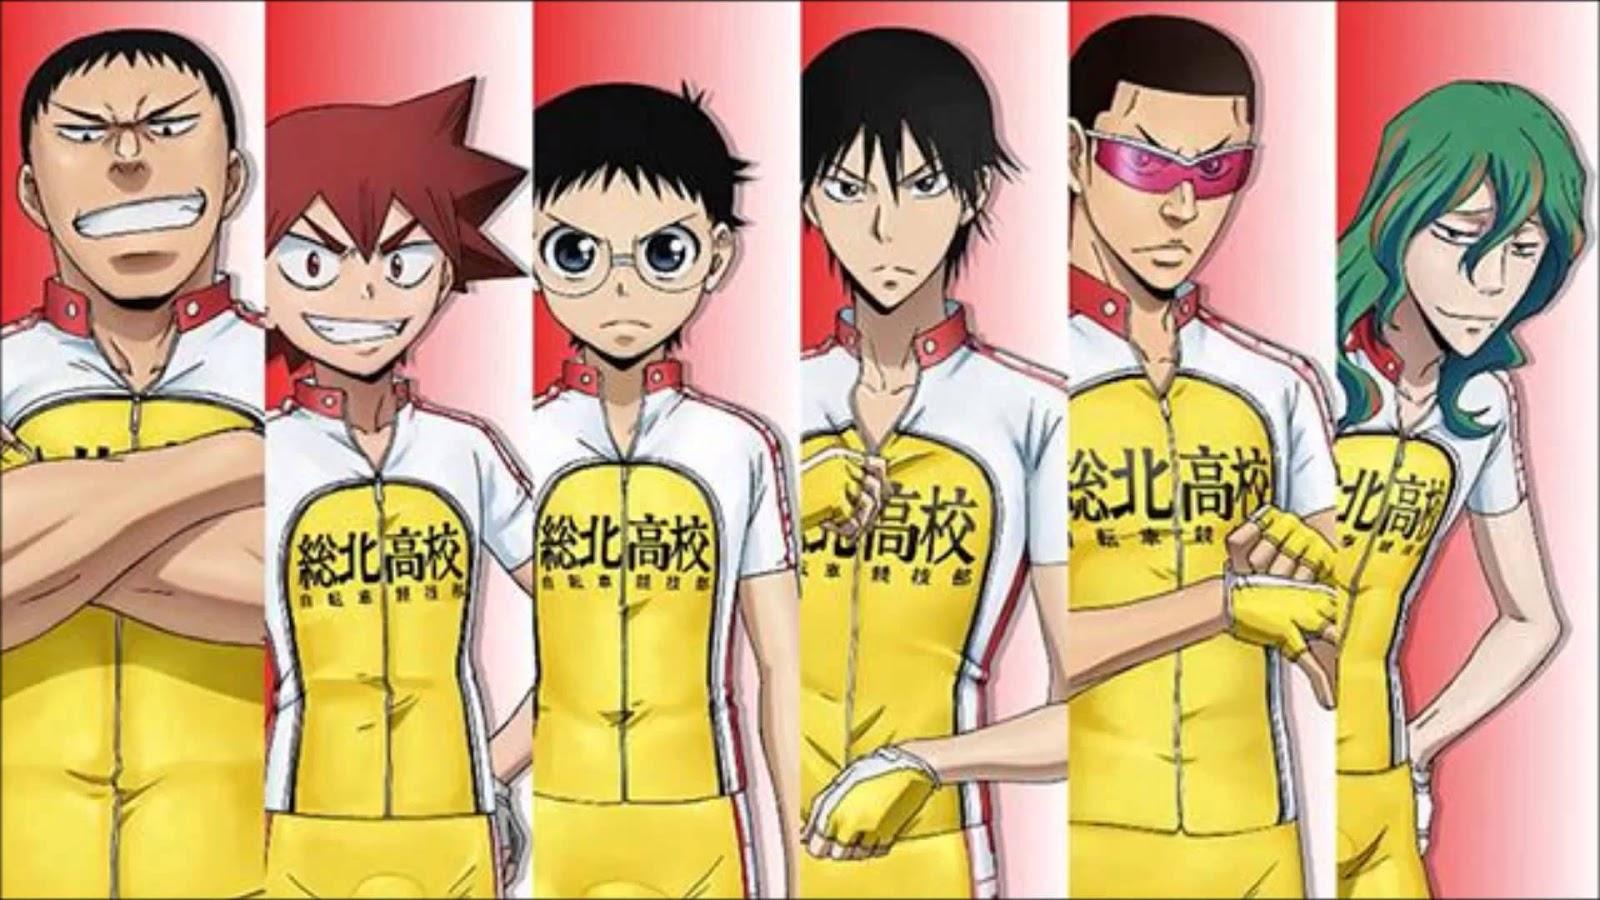 Yowamushi Pedal Anime Season 4 In Production